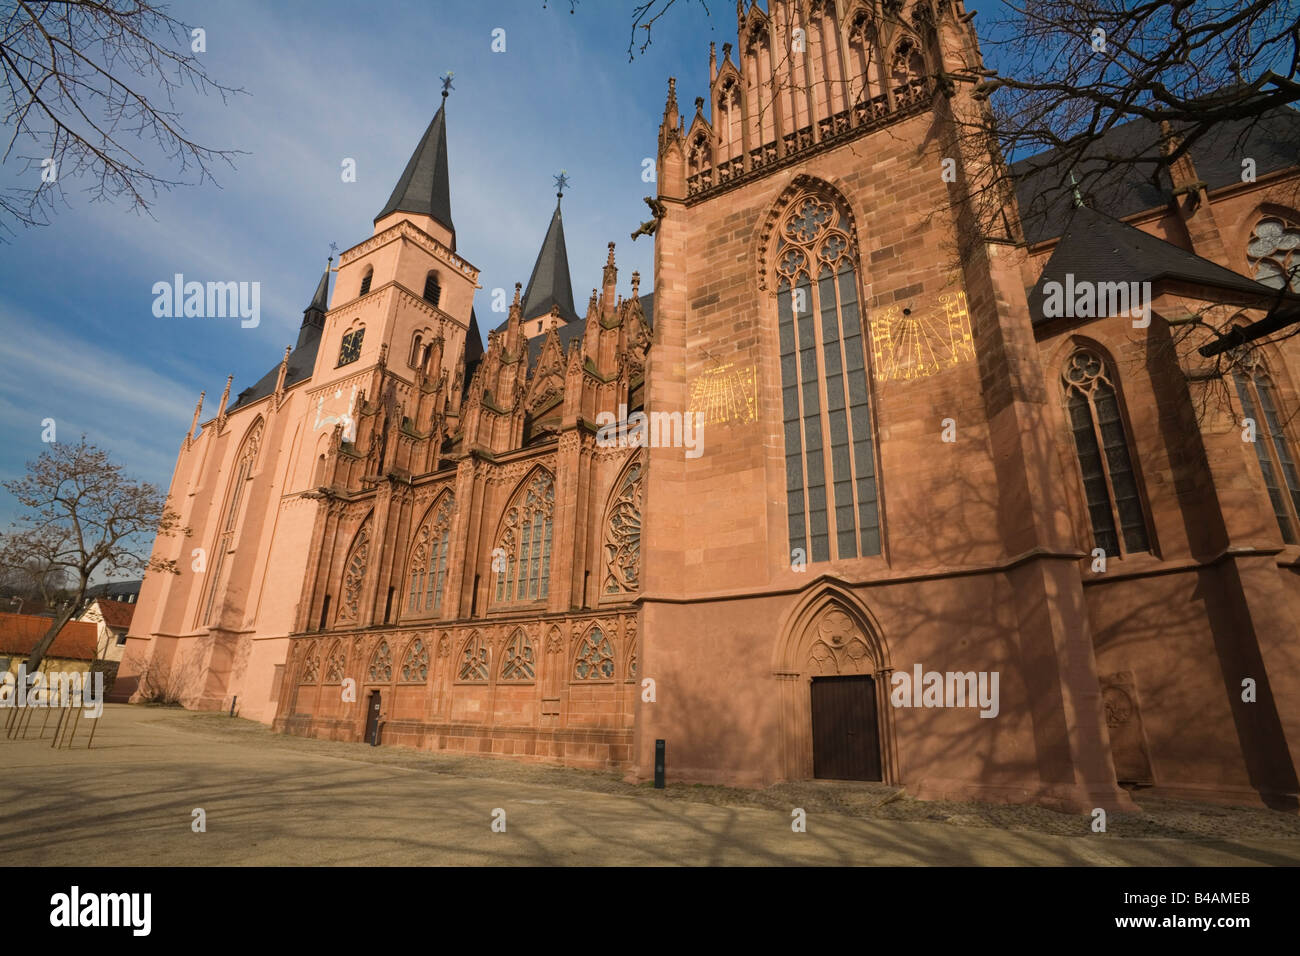 catherines church germany Stock Photo